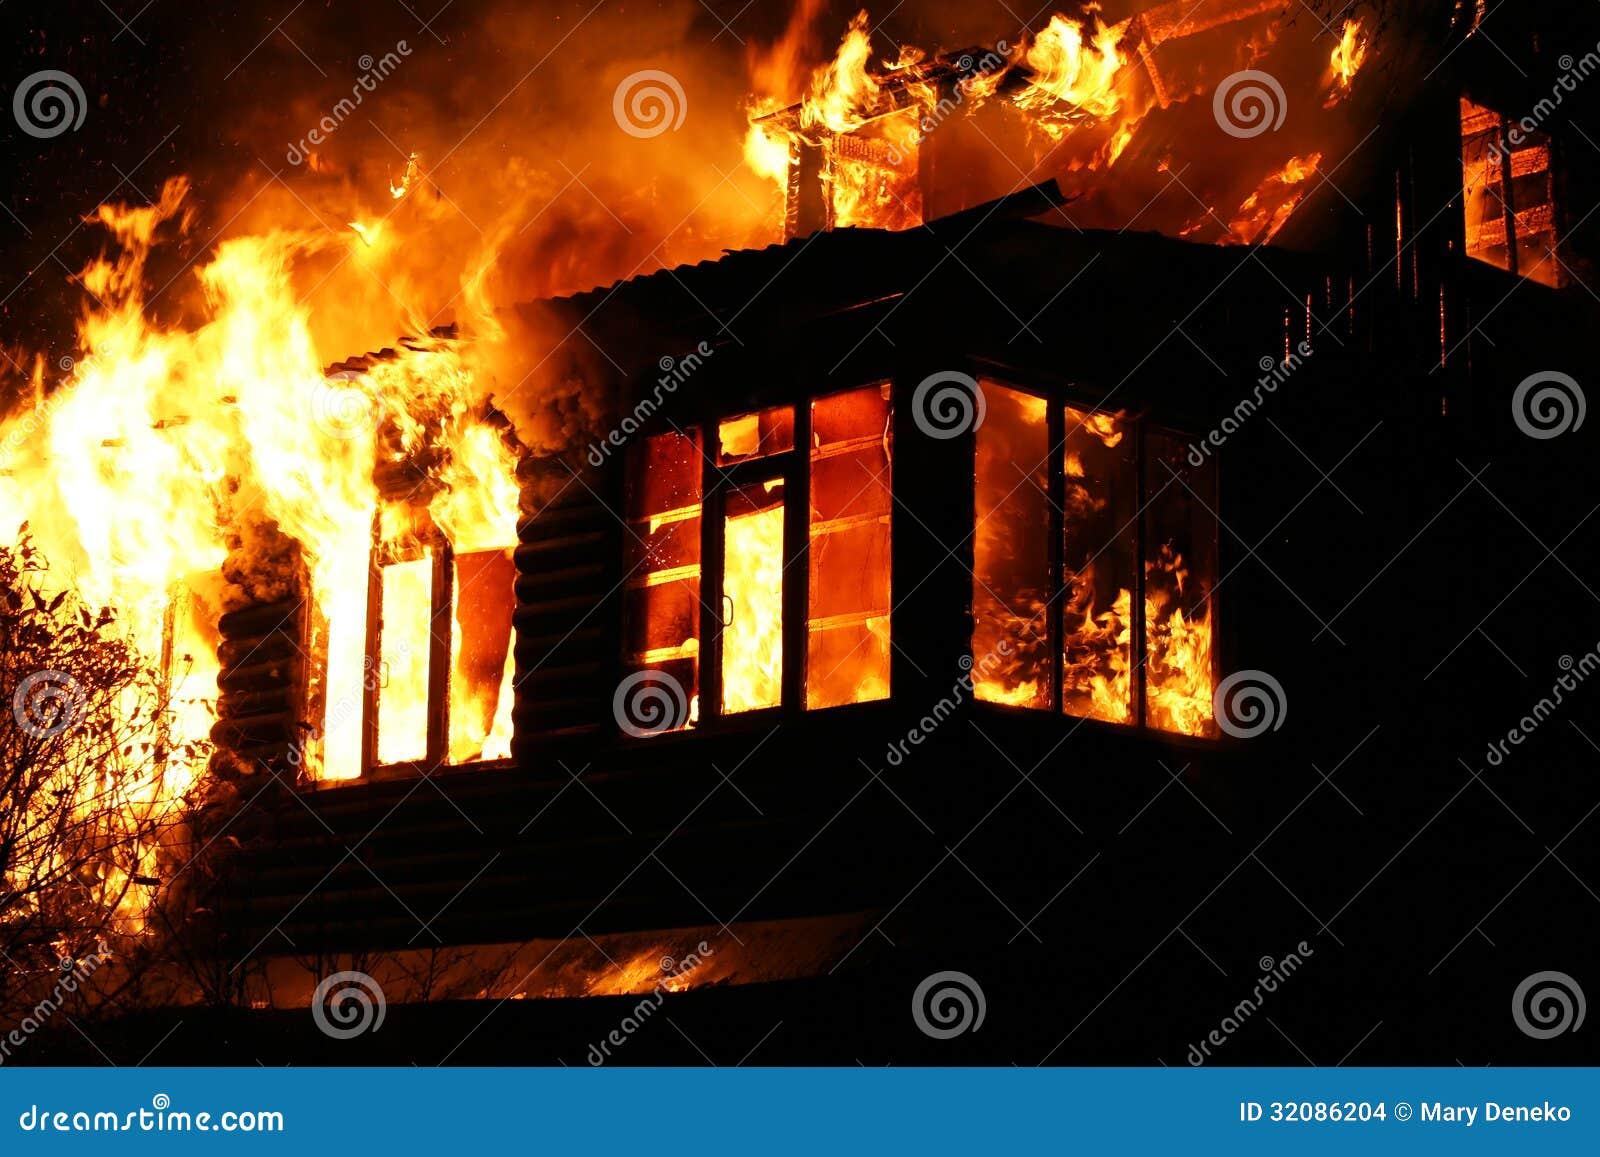 Windows Of The Burning House Stock Images Image 32086204